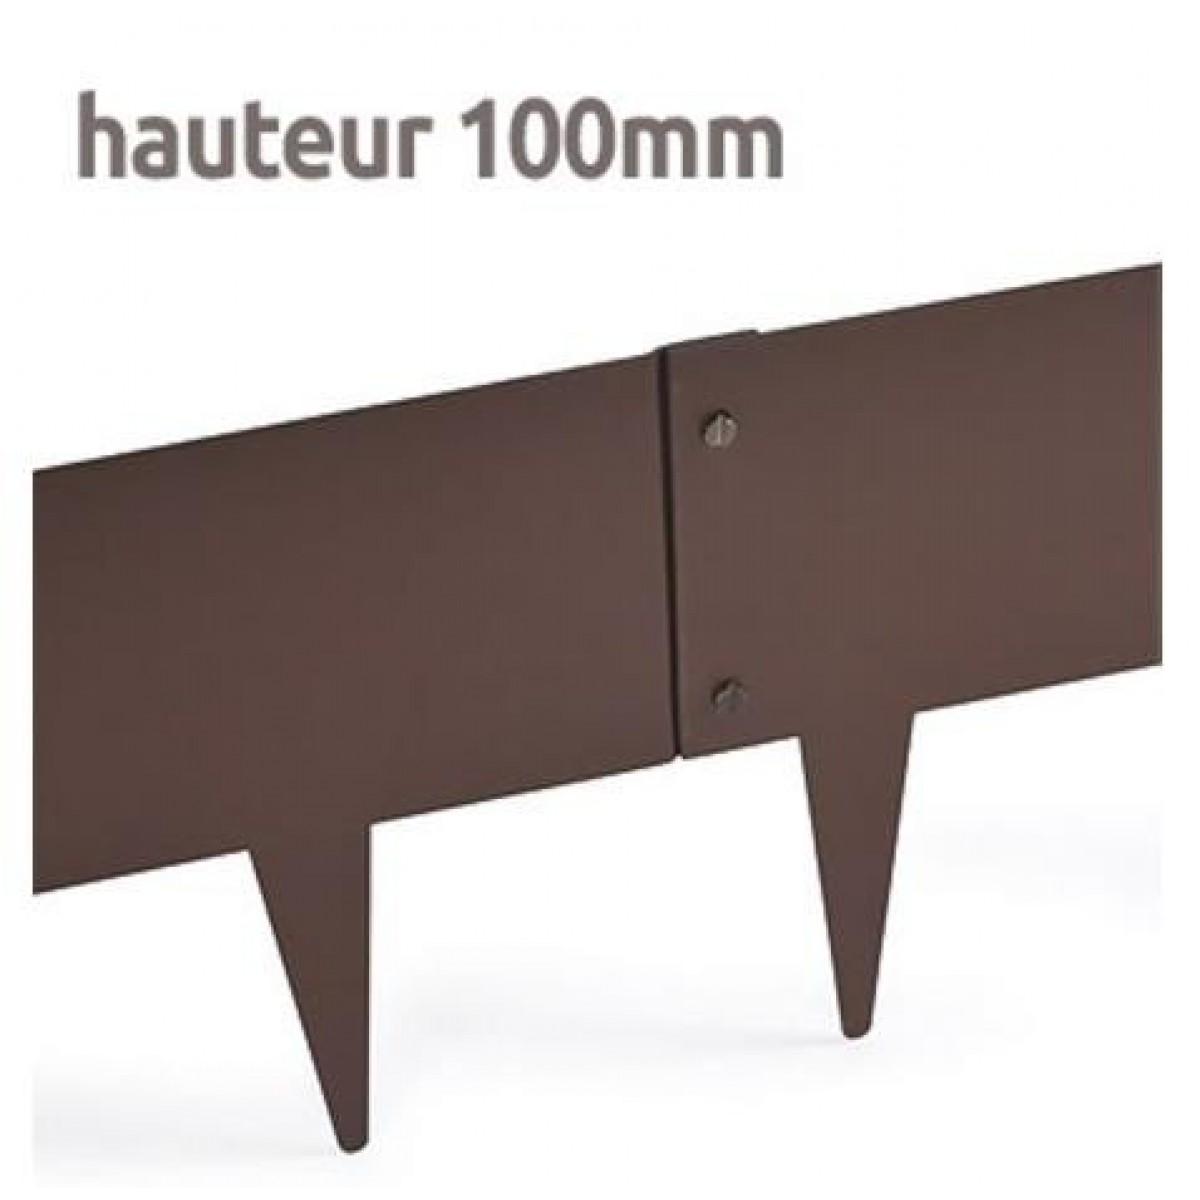 grasboord in metaal 1m x 10 cm. Black Bedroom Furniture Sets. Home Design Ideas